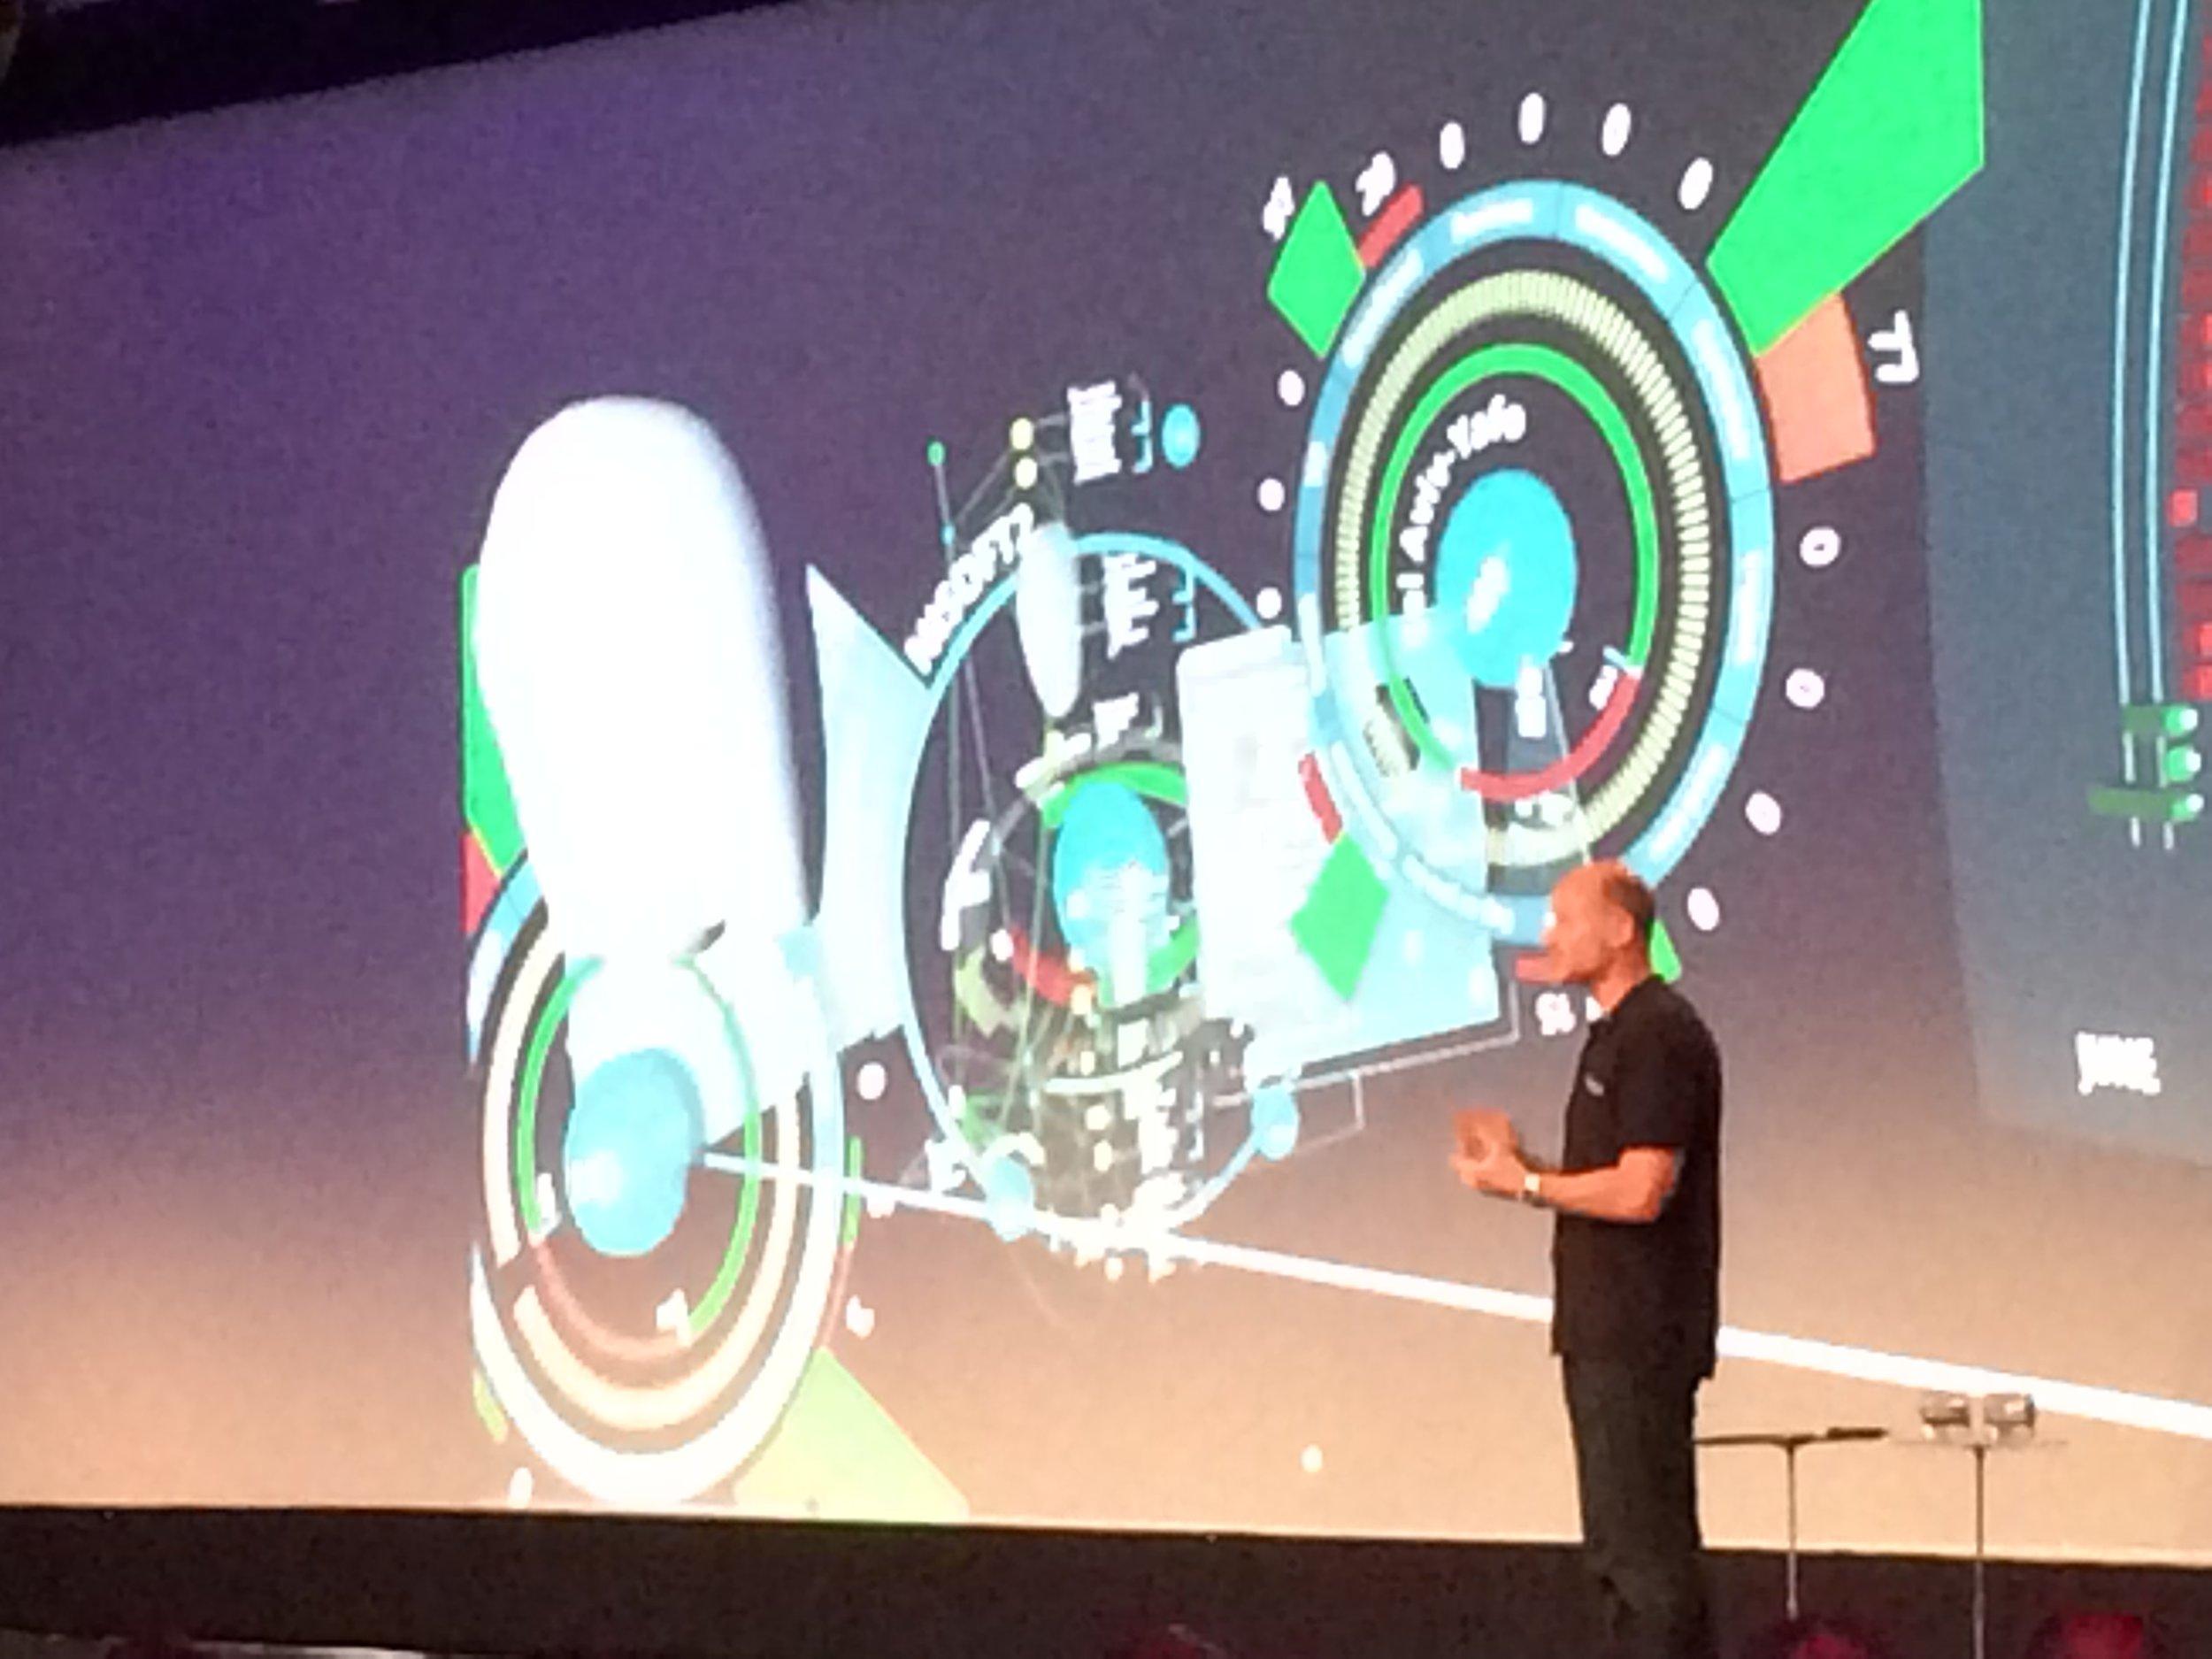 Customer Journey Analytics powered by Virtual Reality